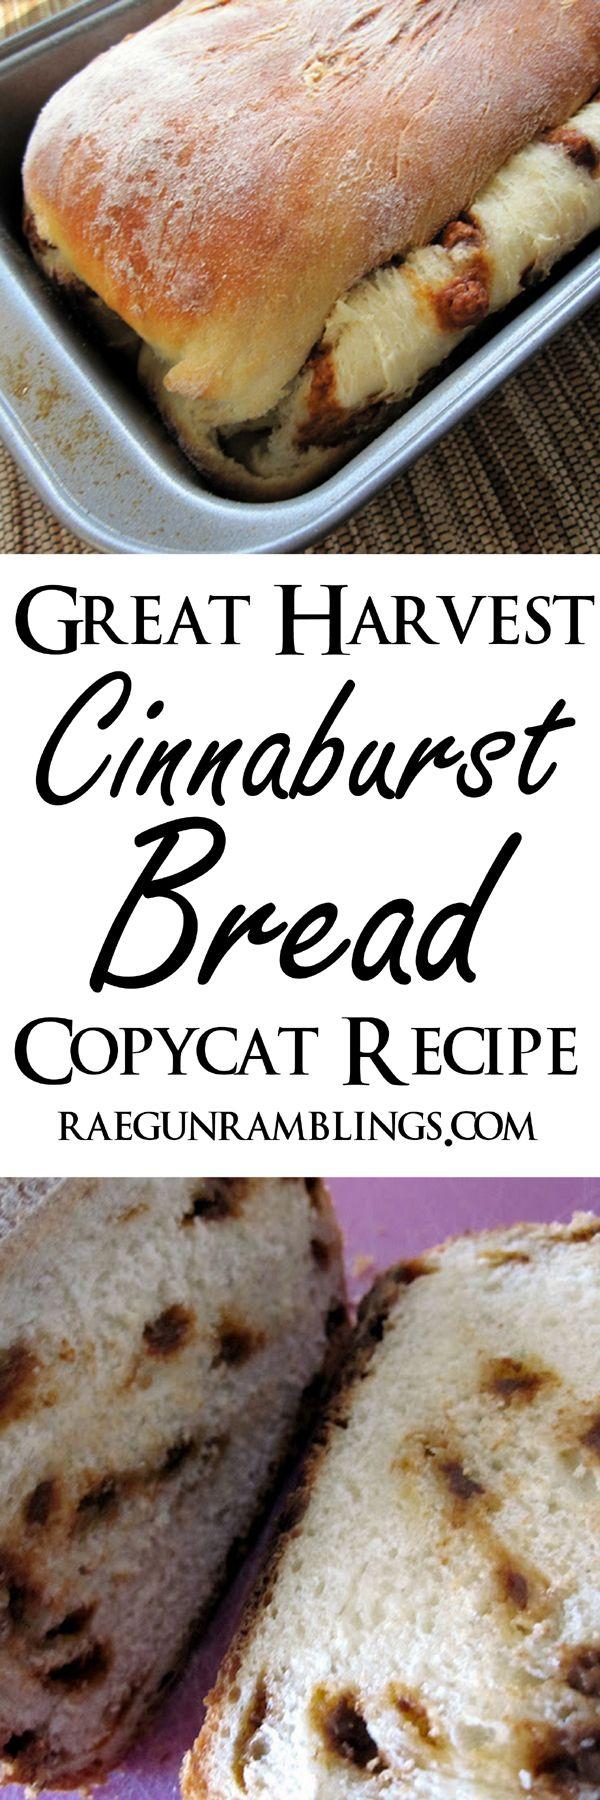 Hands down the best breakfast bread. Great Harvest style cinnaburst bread recipe at Rae Gun Ramblings